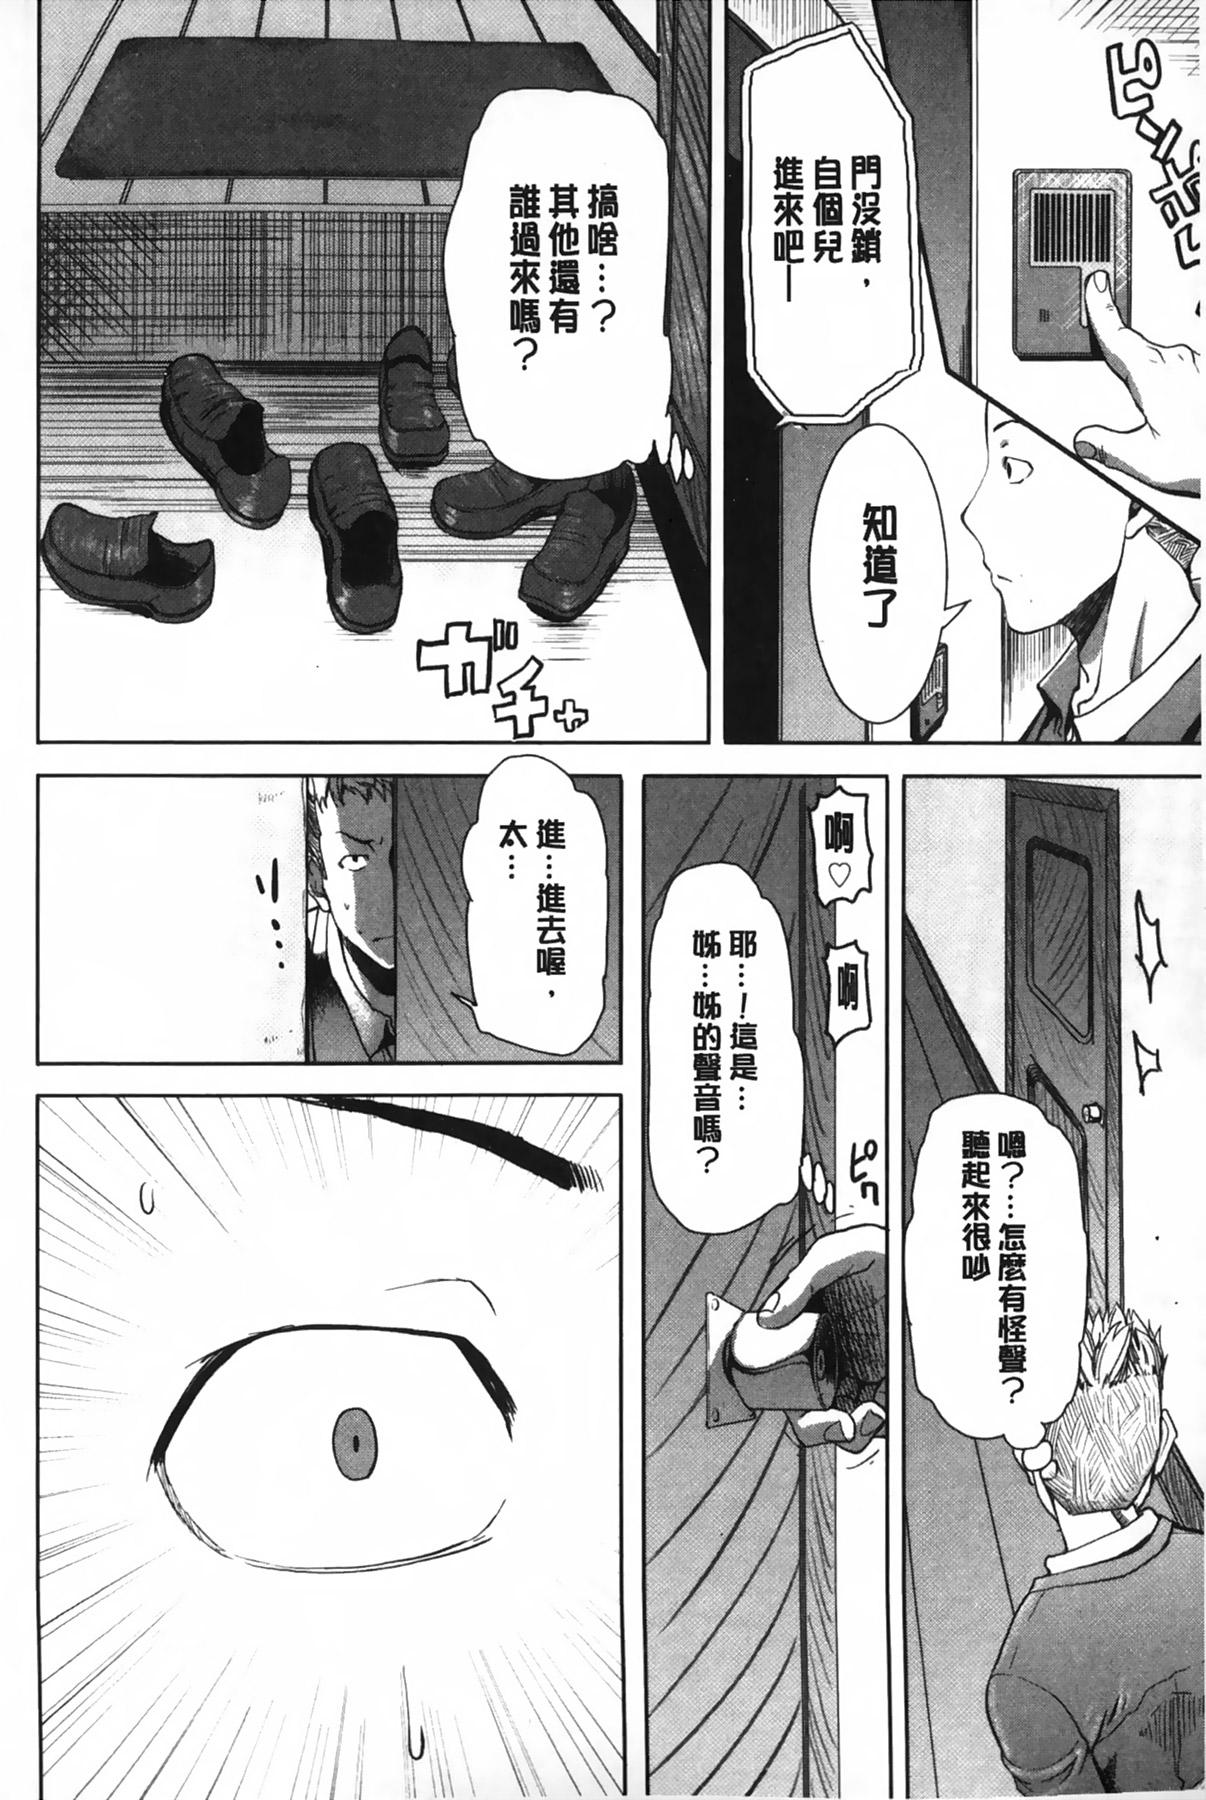 Ane Unsweet - Mihiragi Hiyori + | 姊姊不甜美 彌平木日和+ 72